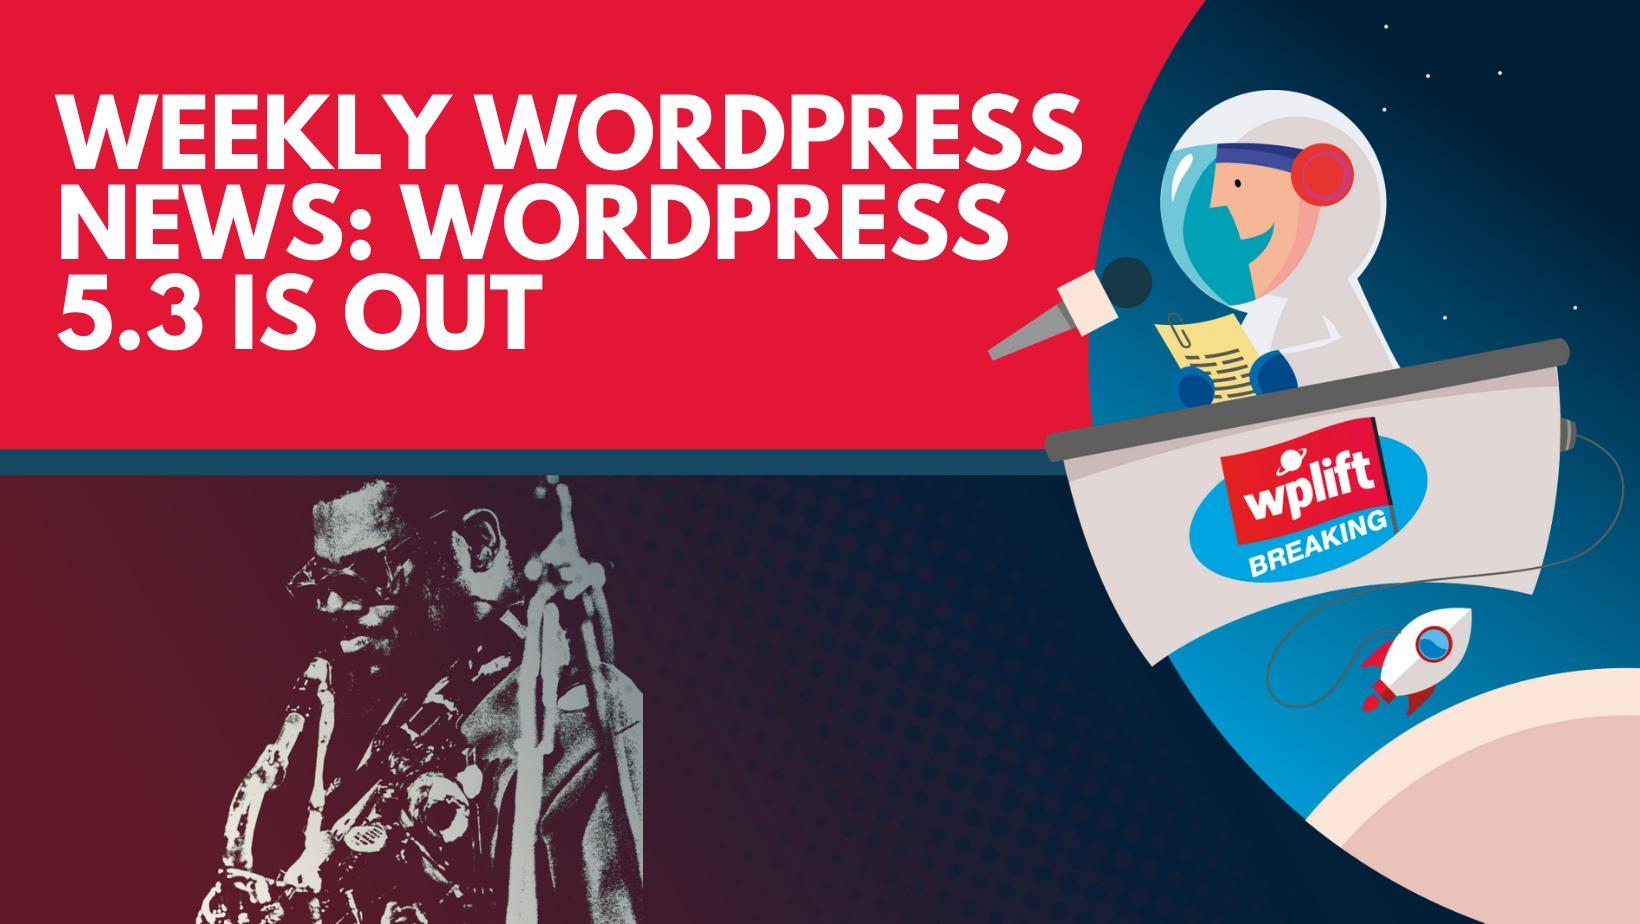 weekly-wordpress-news:-wordpress-5.3-is-out!